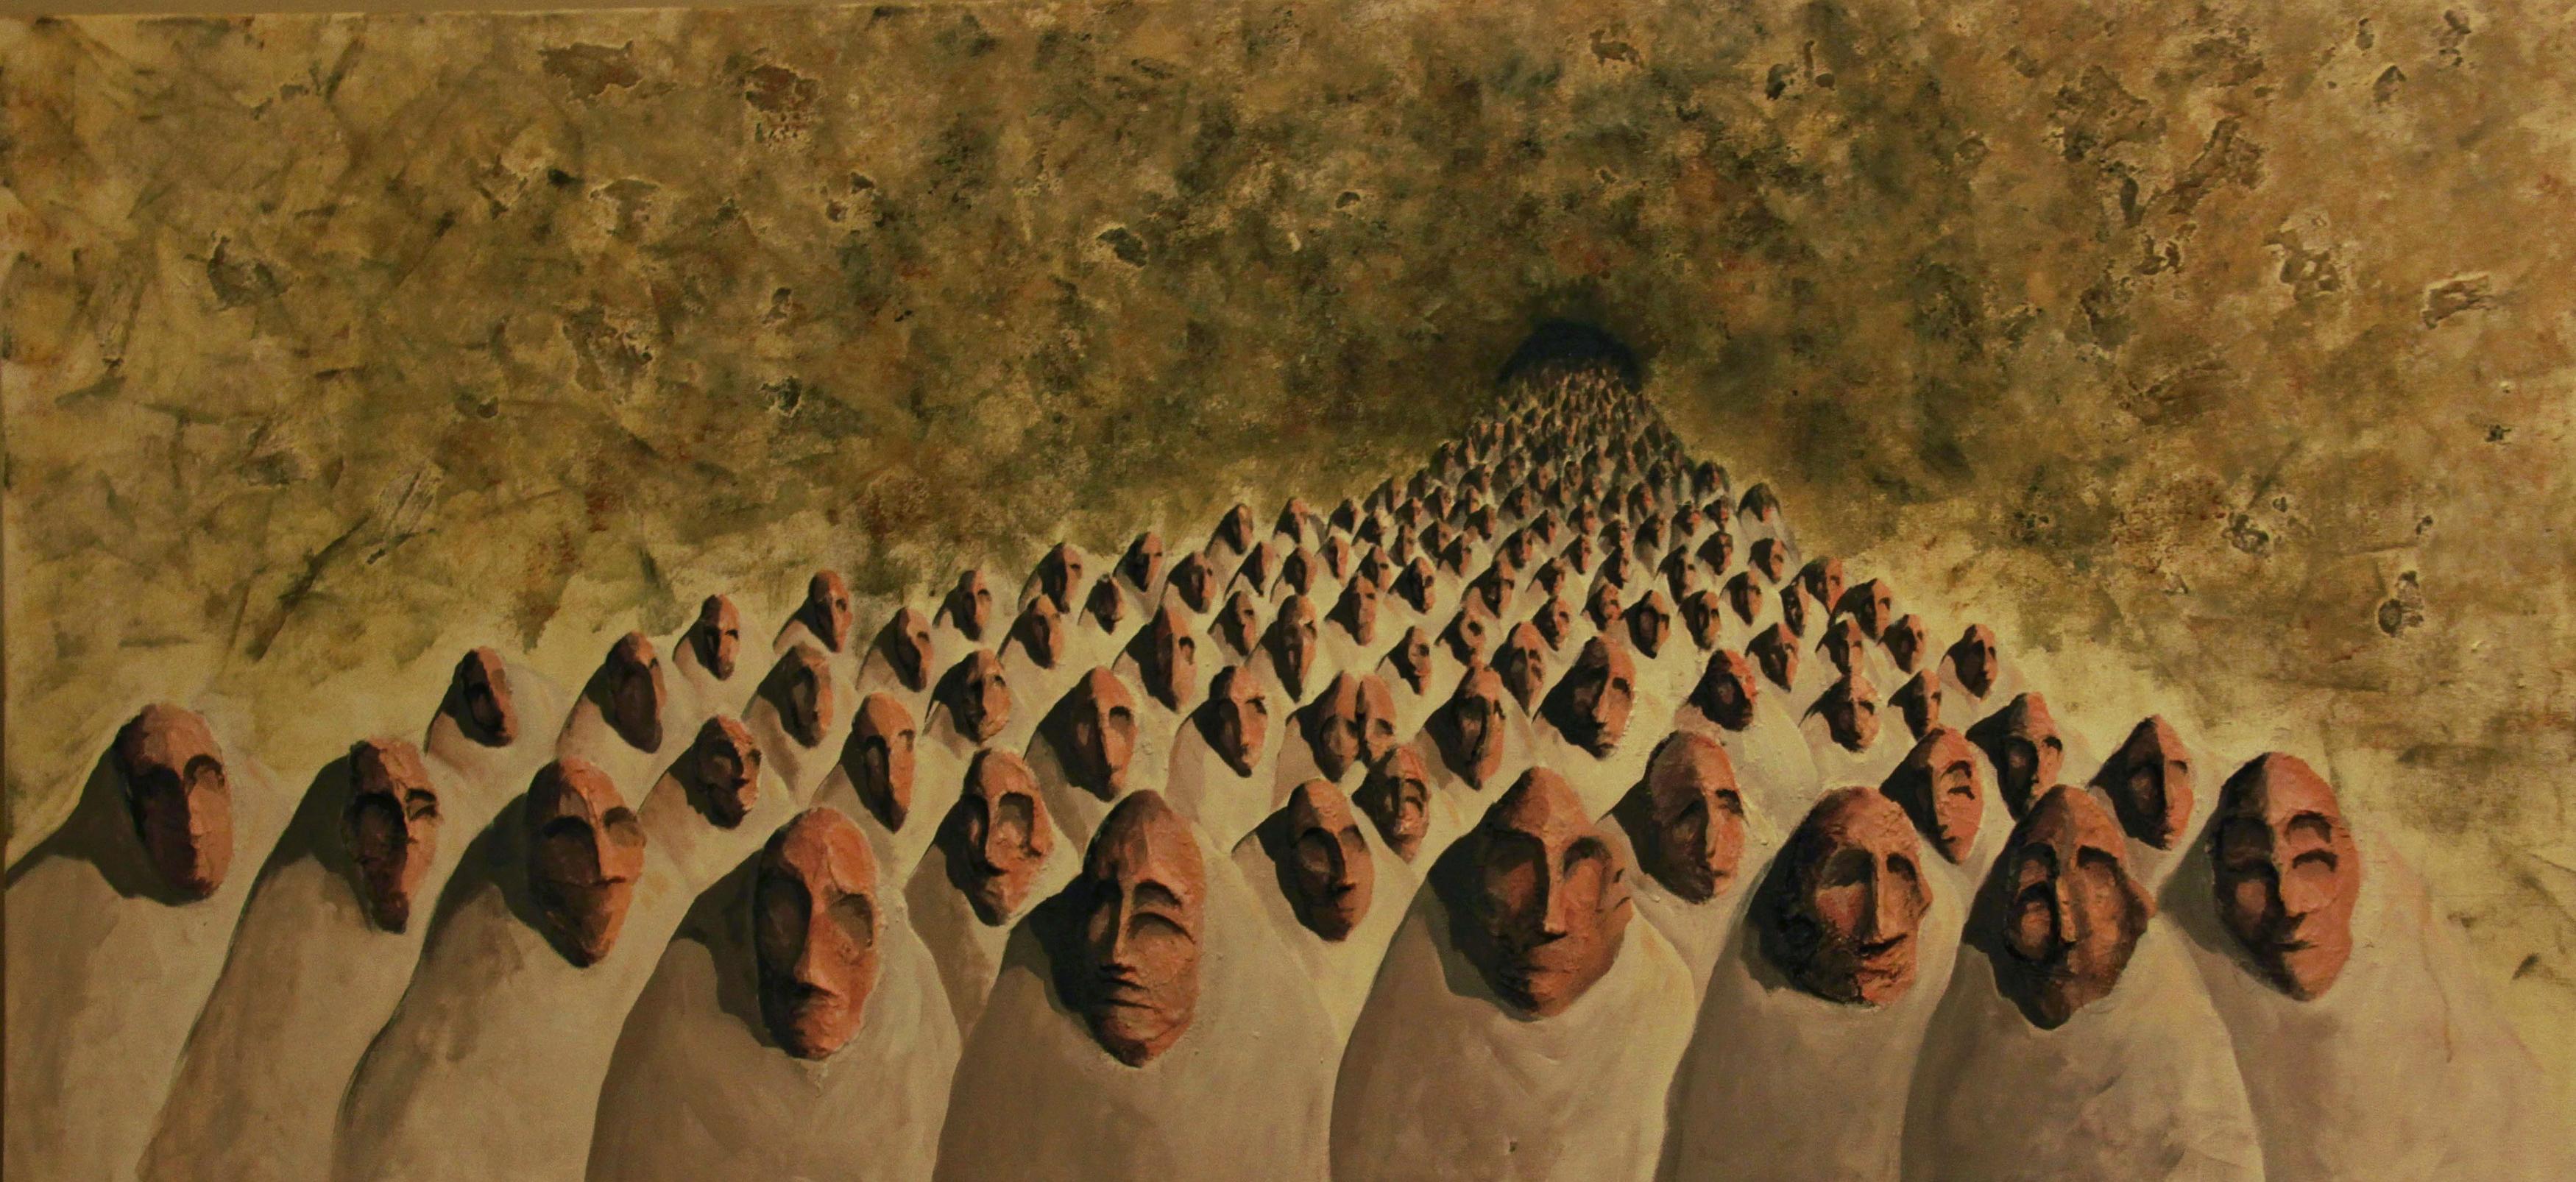 The Herd I